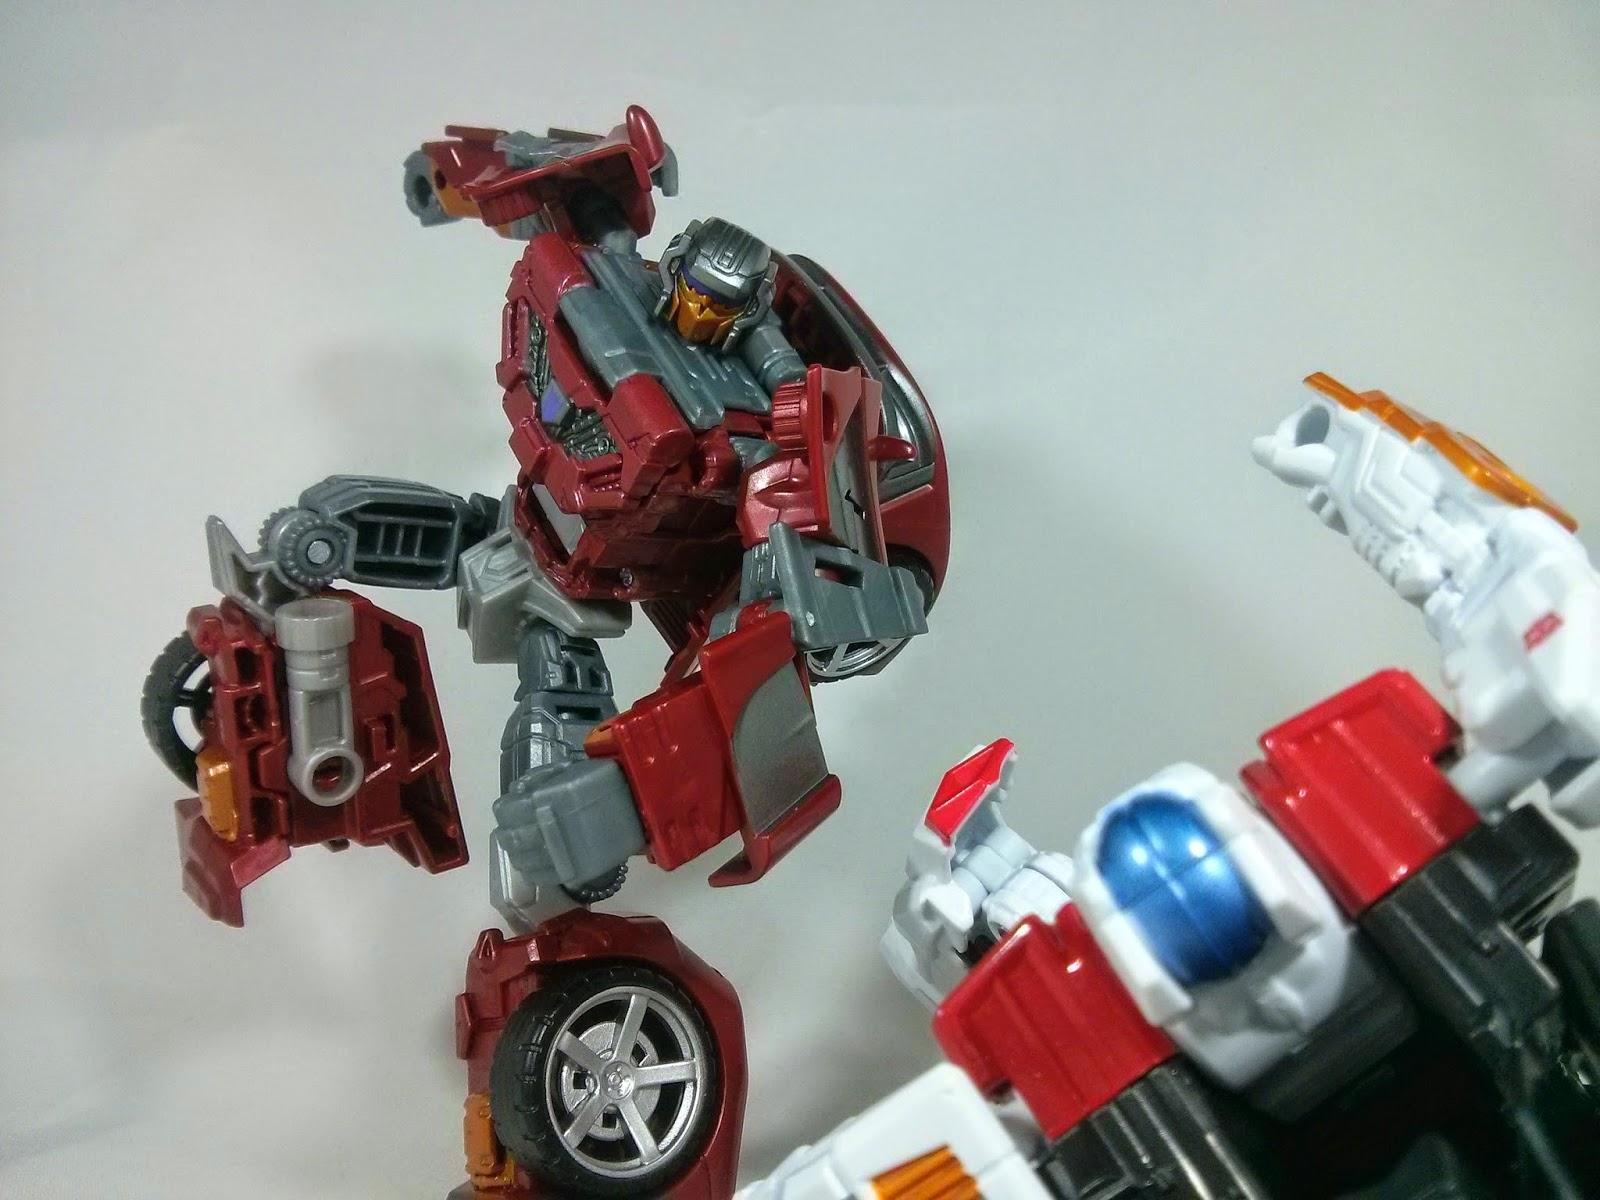 Transformers Generations Dead End